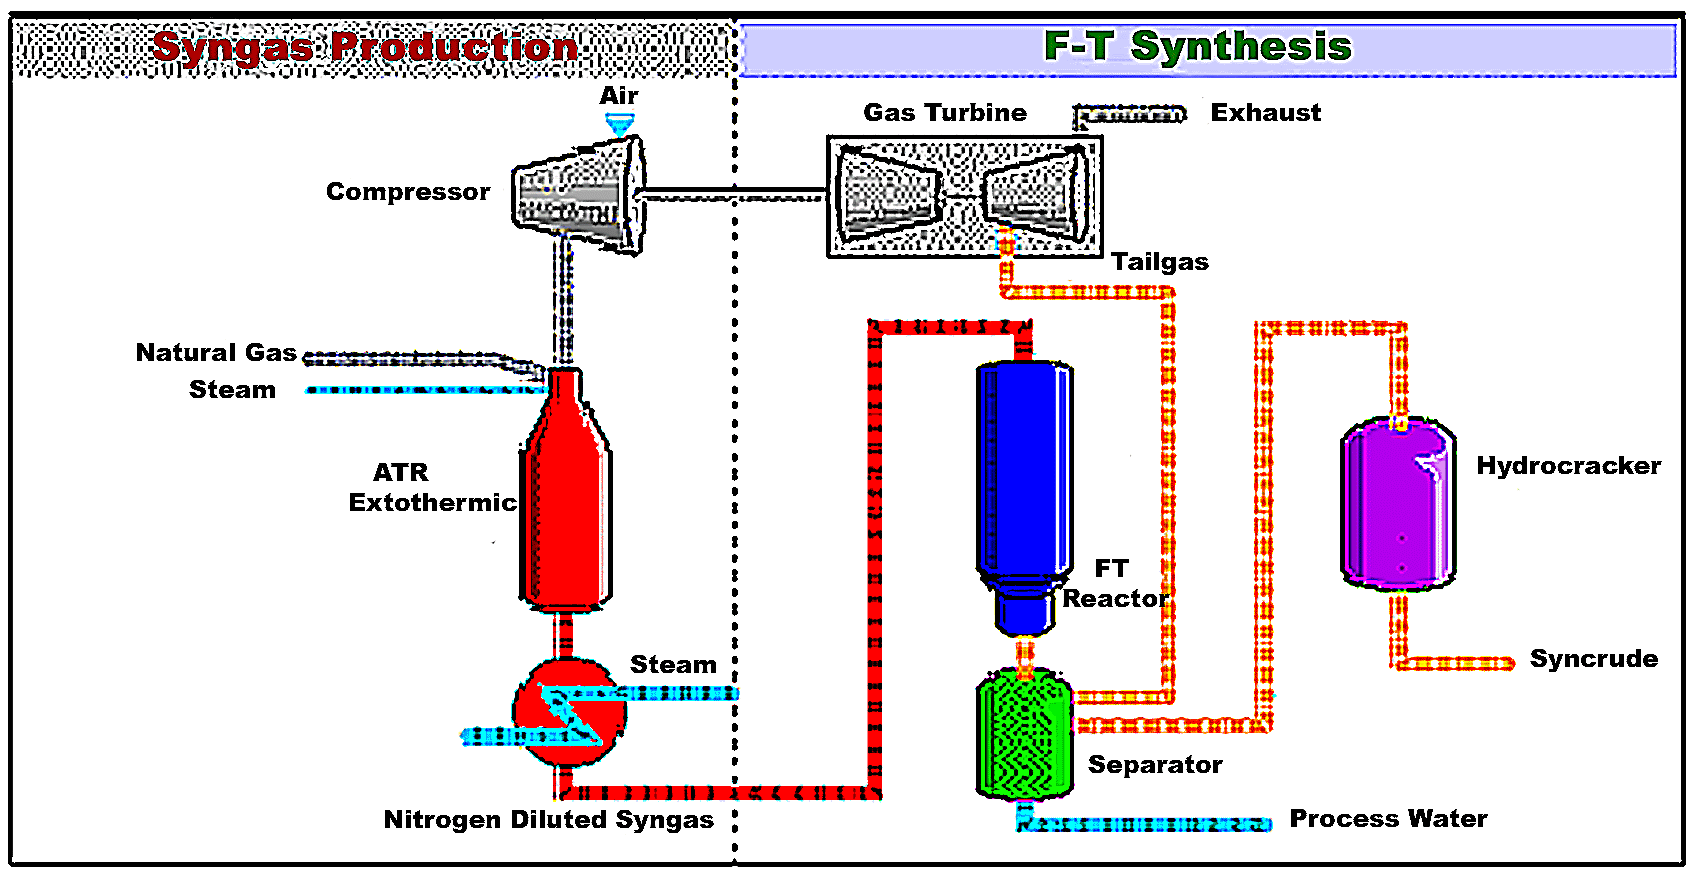 fischer tropsch process flow diagram 1991 nissan 240sx ignition wiring file fischertropsch png wikipedia